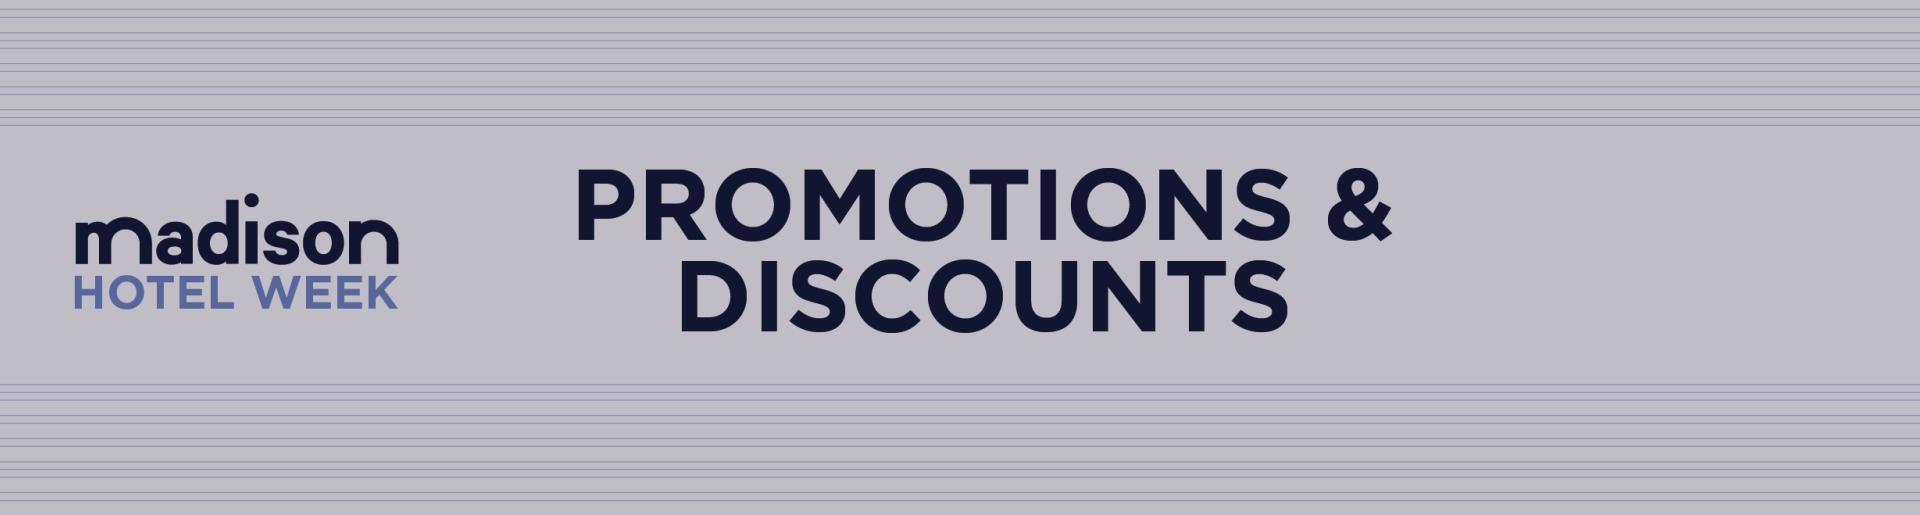 Madison Hotel Week: Promotions